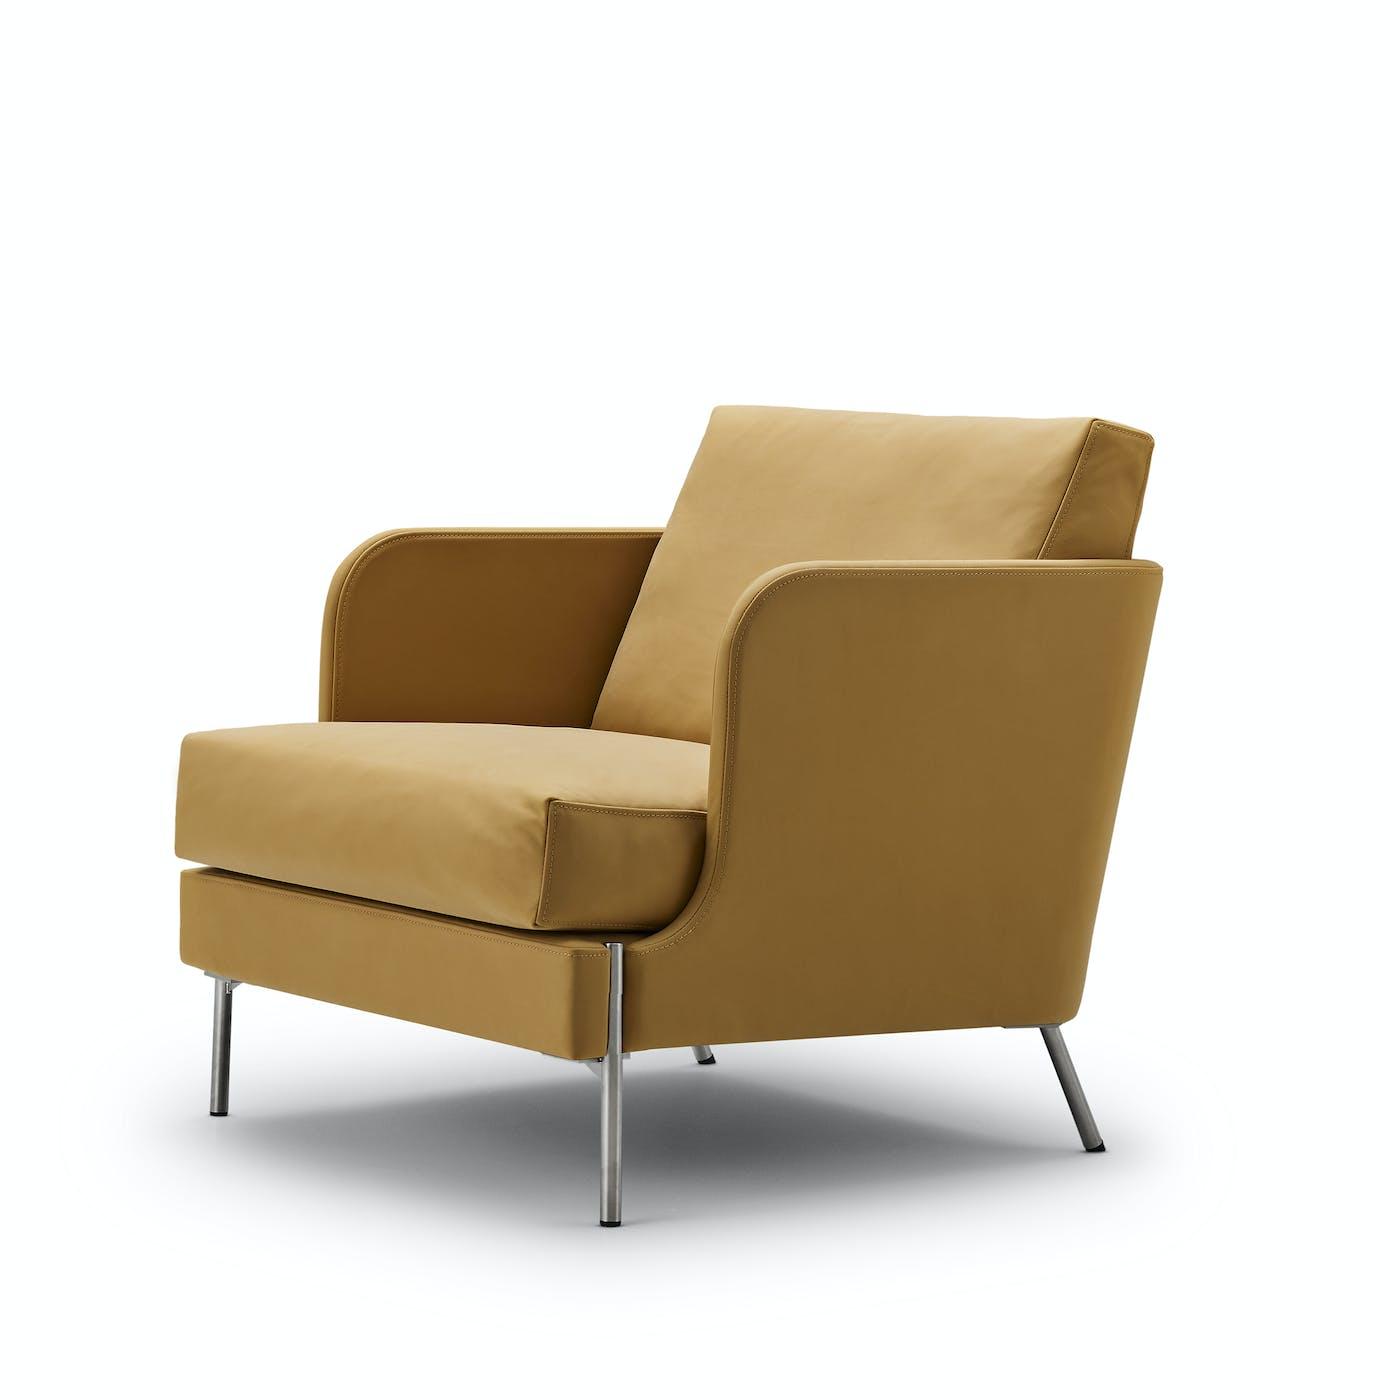 Funen chair low back 70x77 cm Flux ginger 2 83226 1